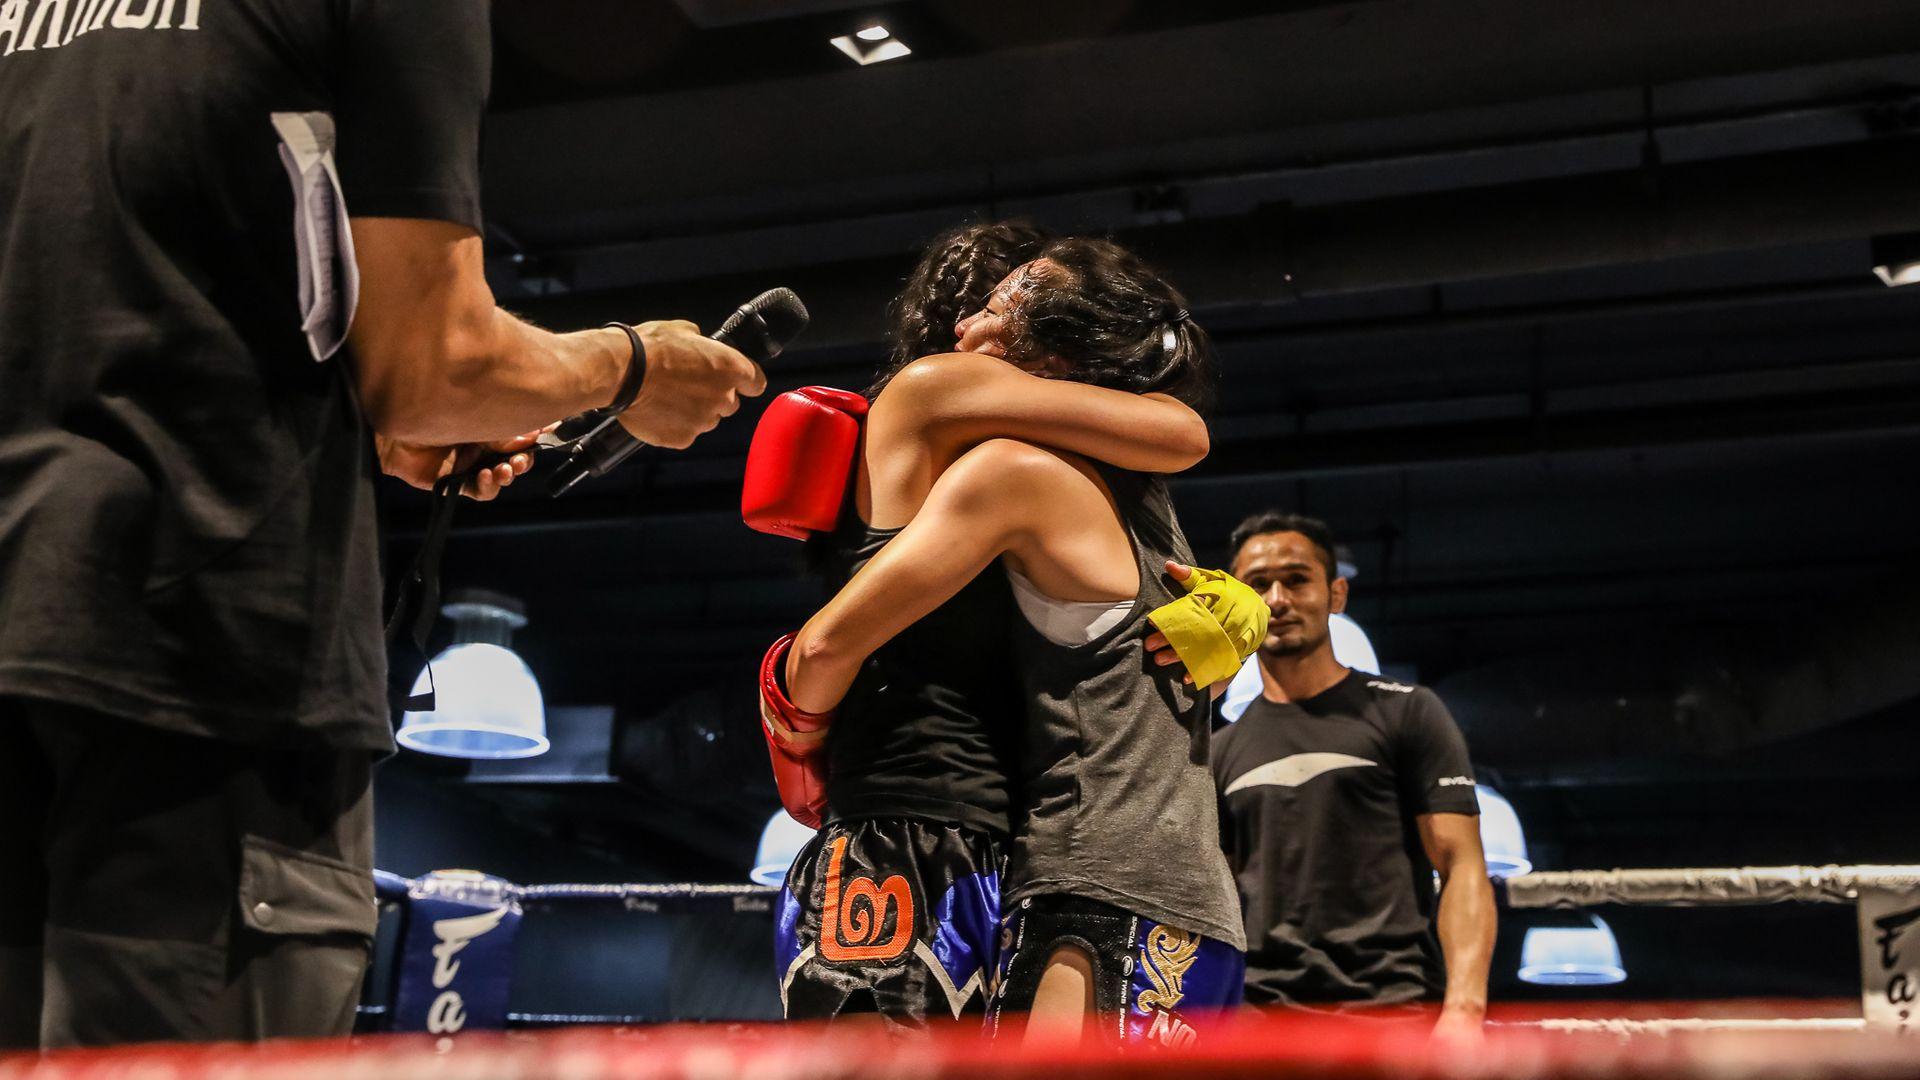 Sportsmanship-Hug